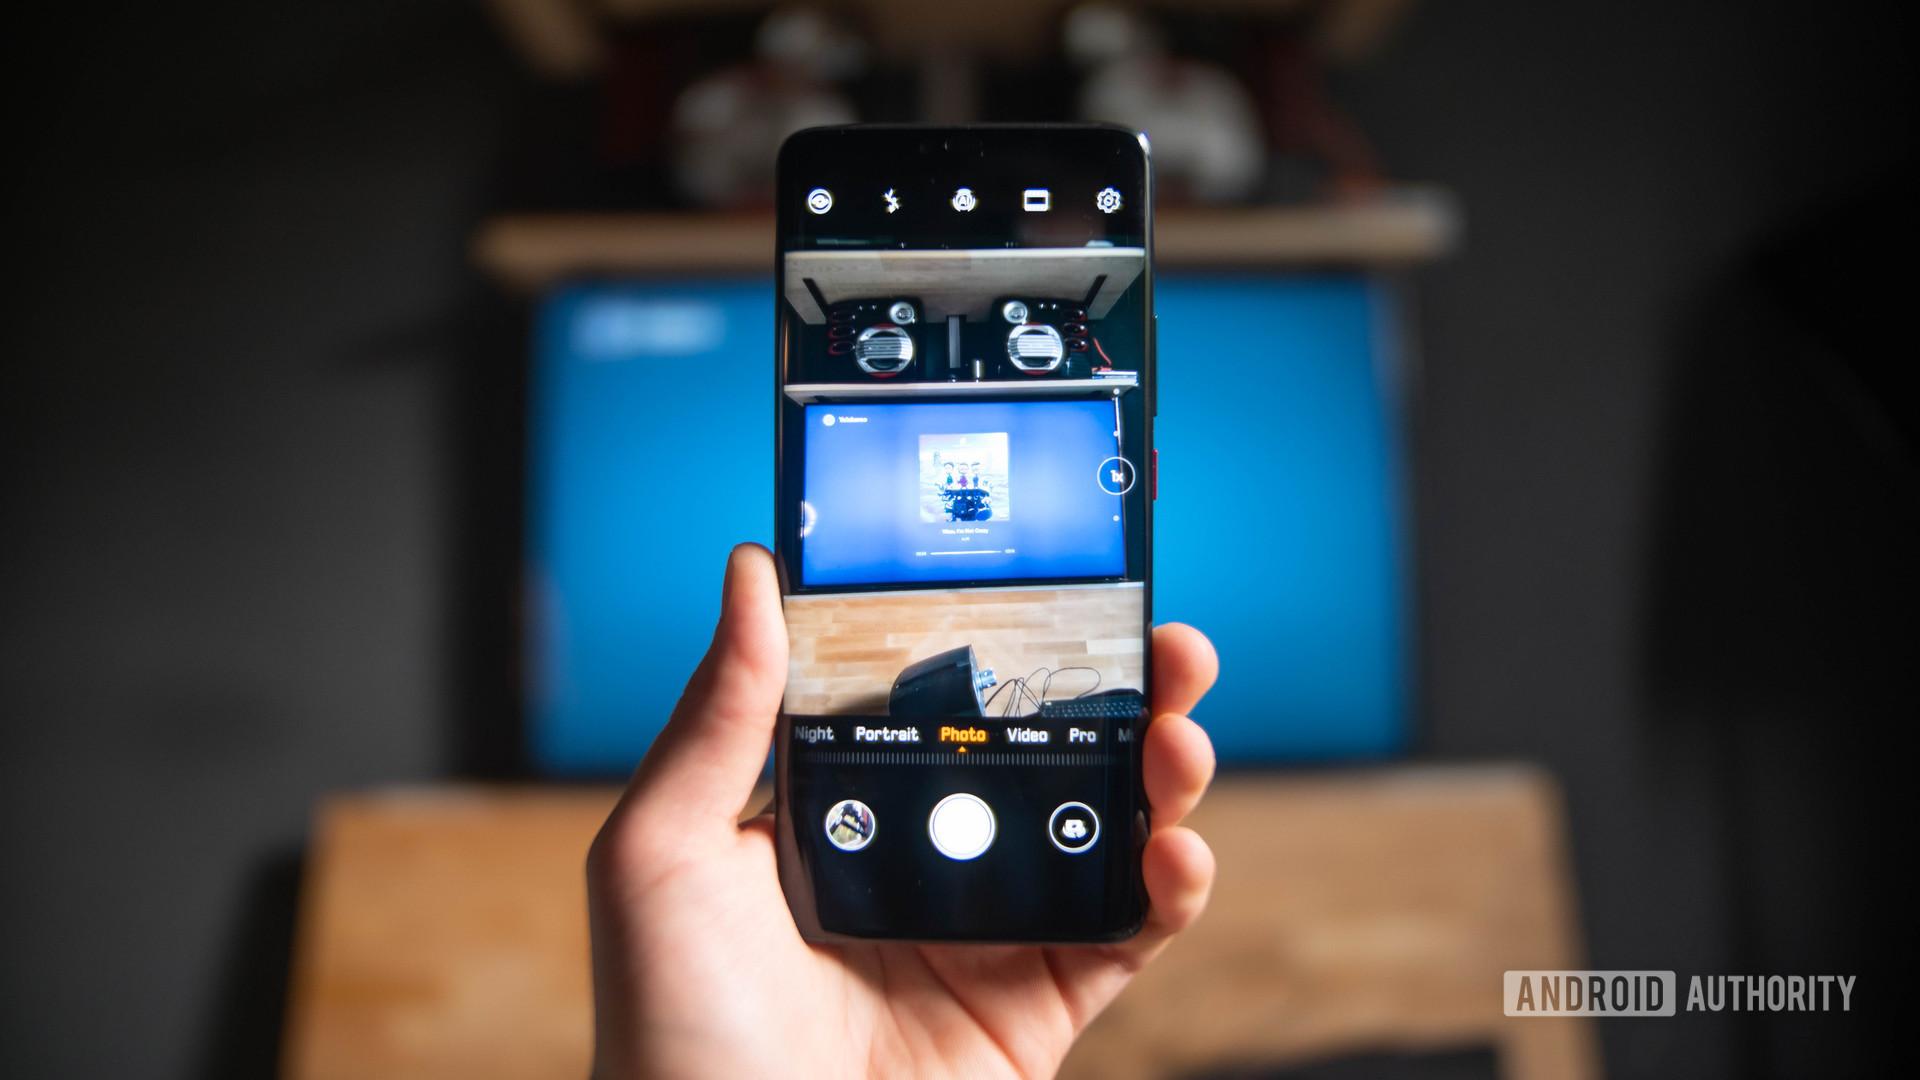 Huawei Mate 20 Pro camera app